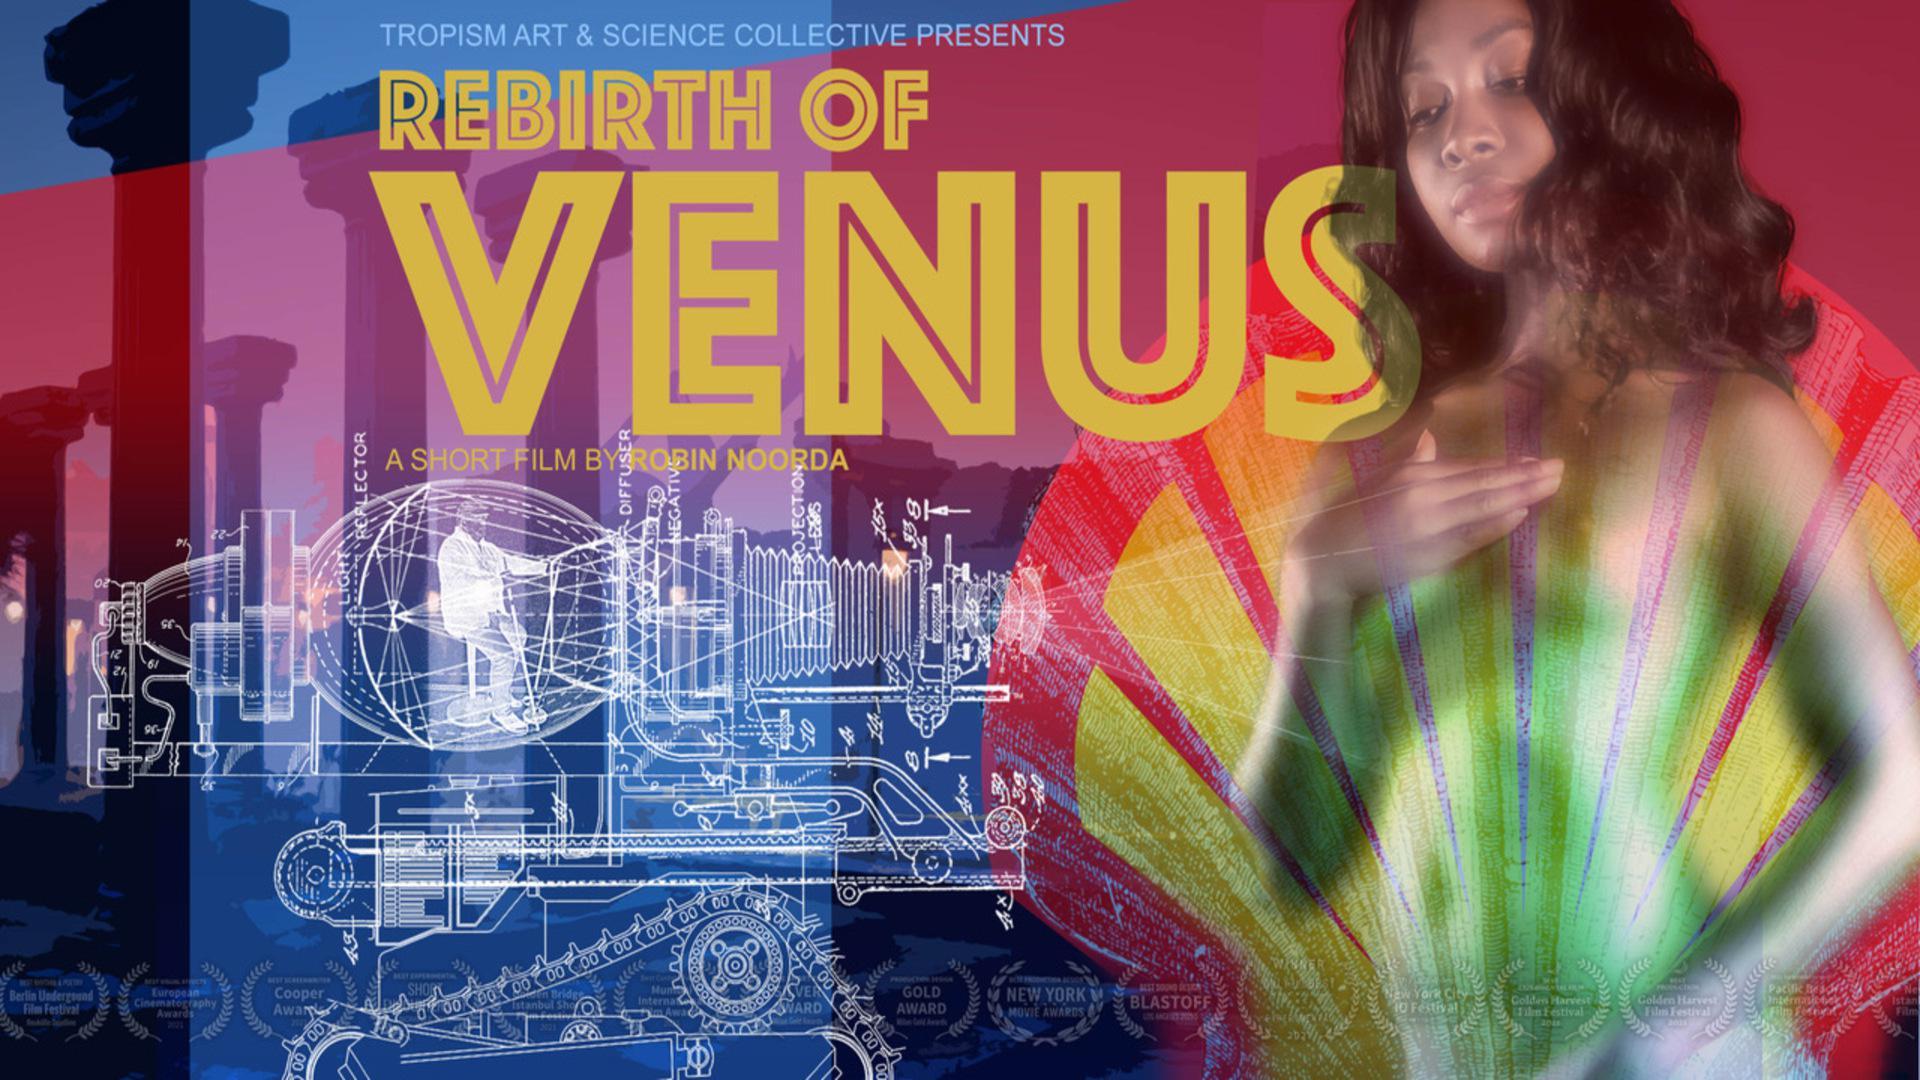 Rebirth of Venus